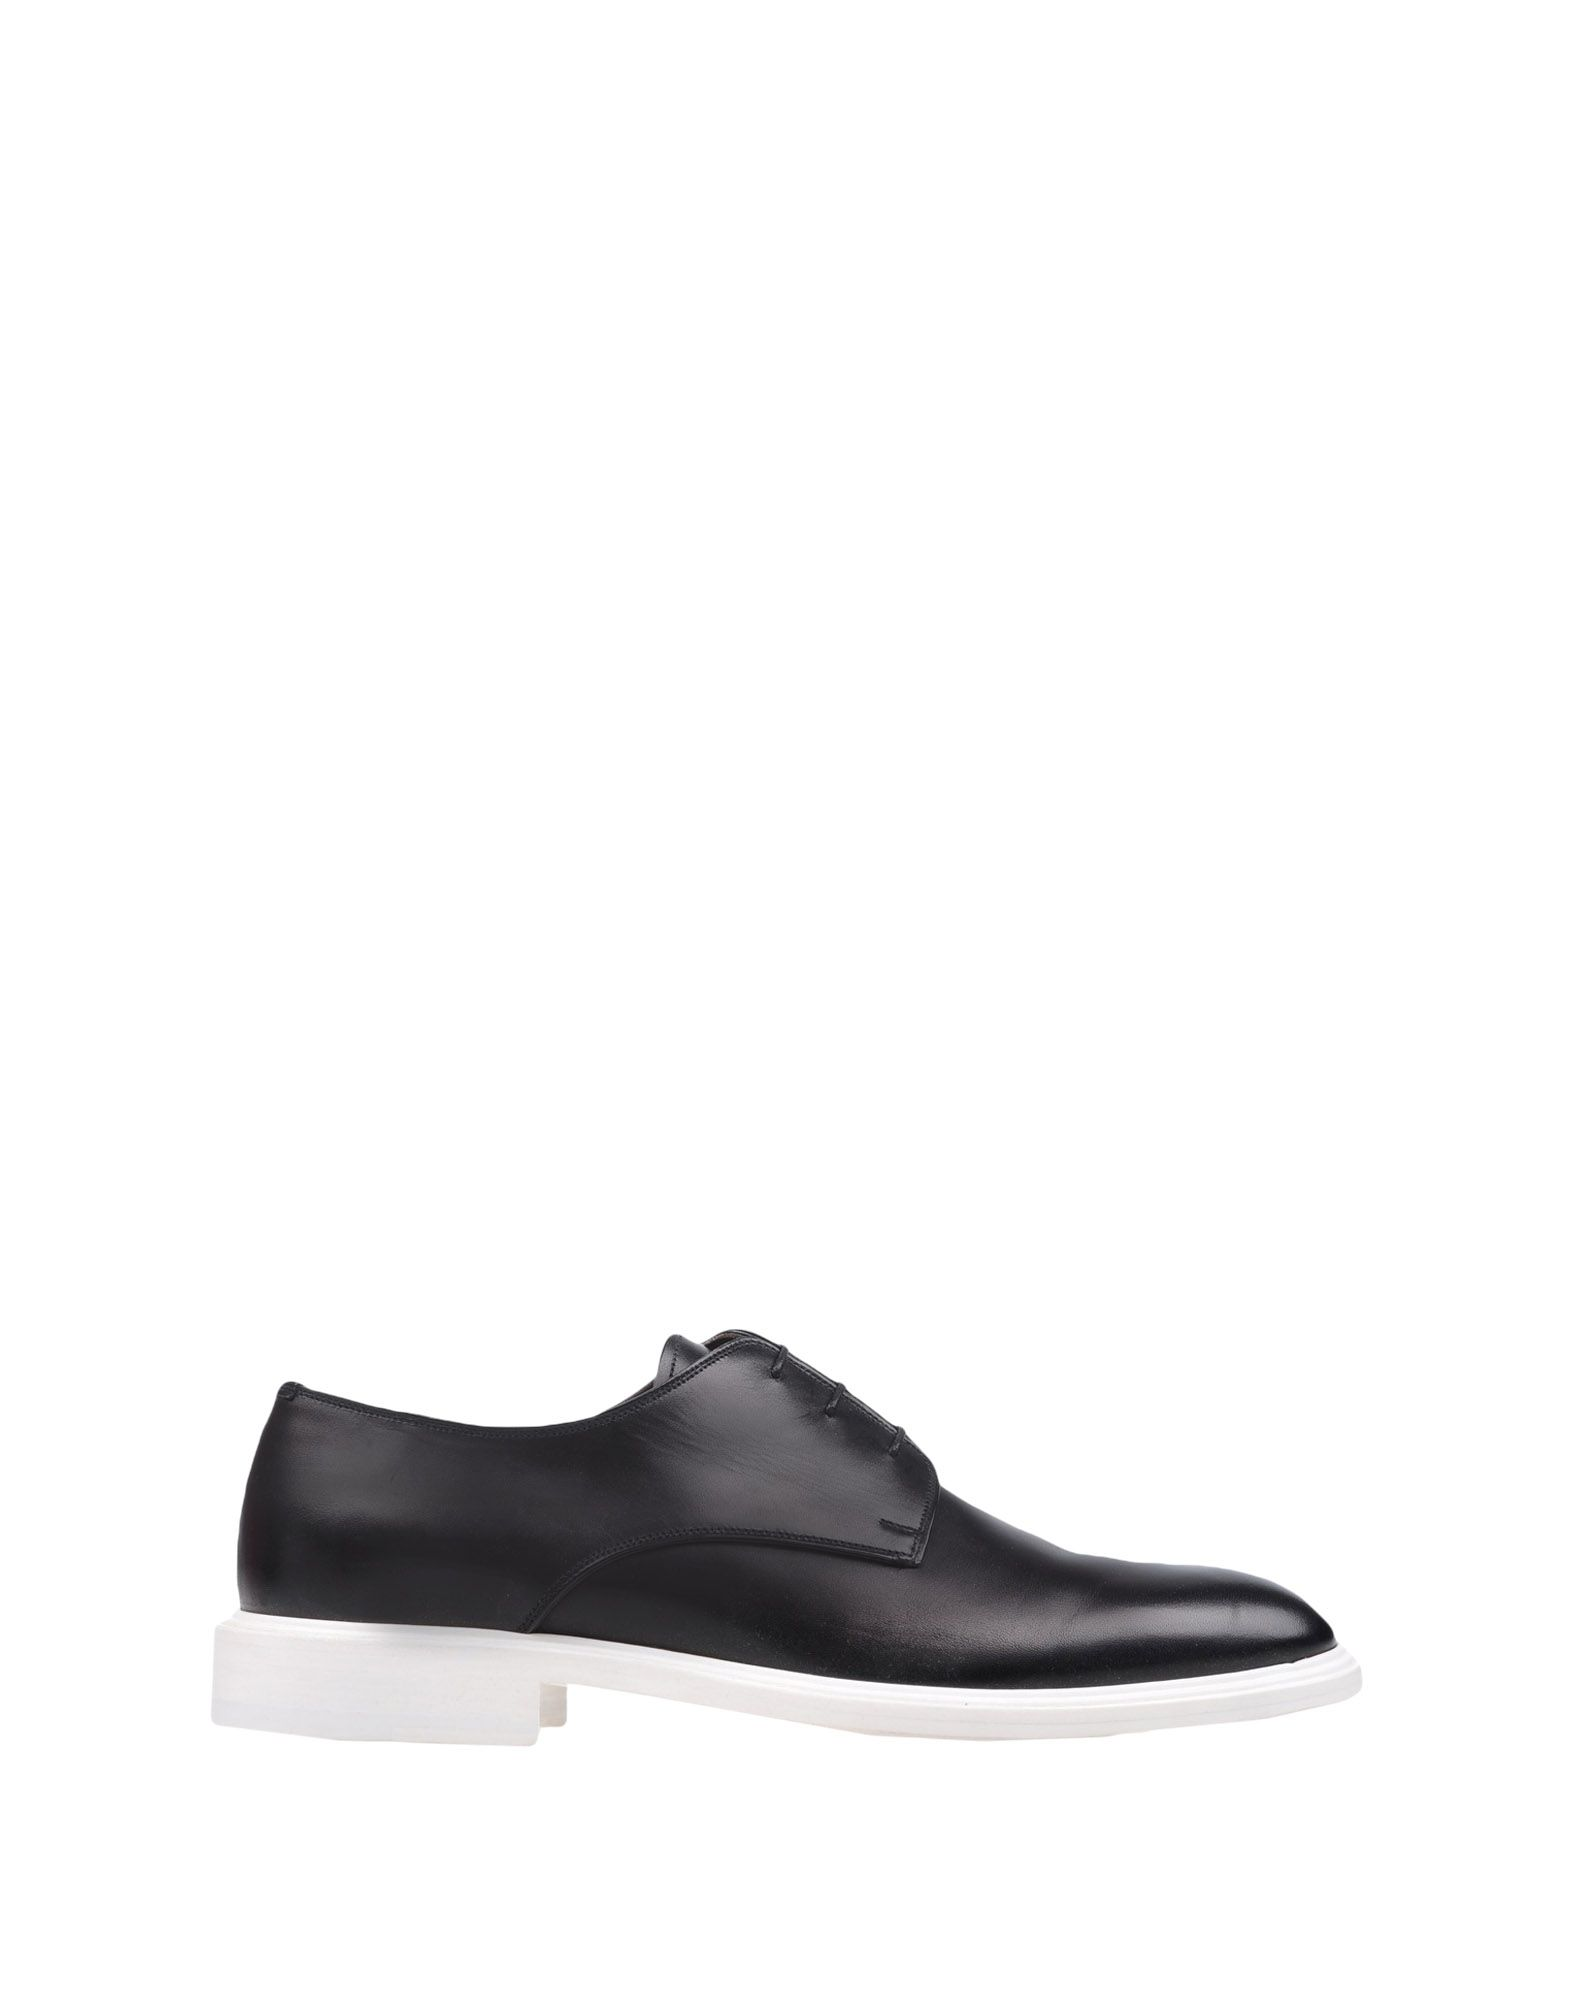 Givenchy Gute Schnürschuhe Herren  11319578NG Gute Givenchy Qualität beliebte Schuhe 301db9